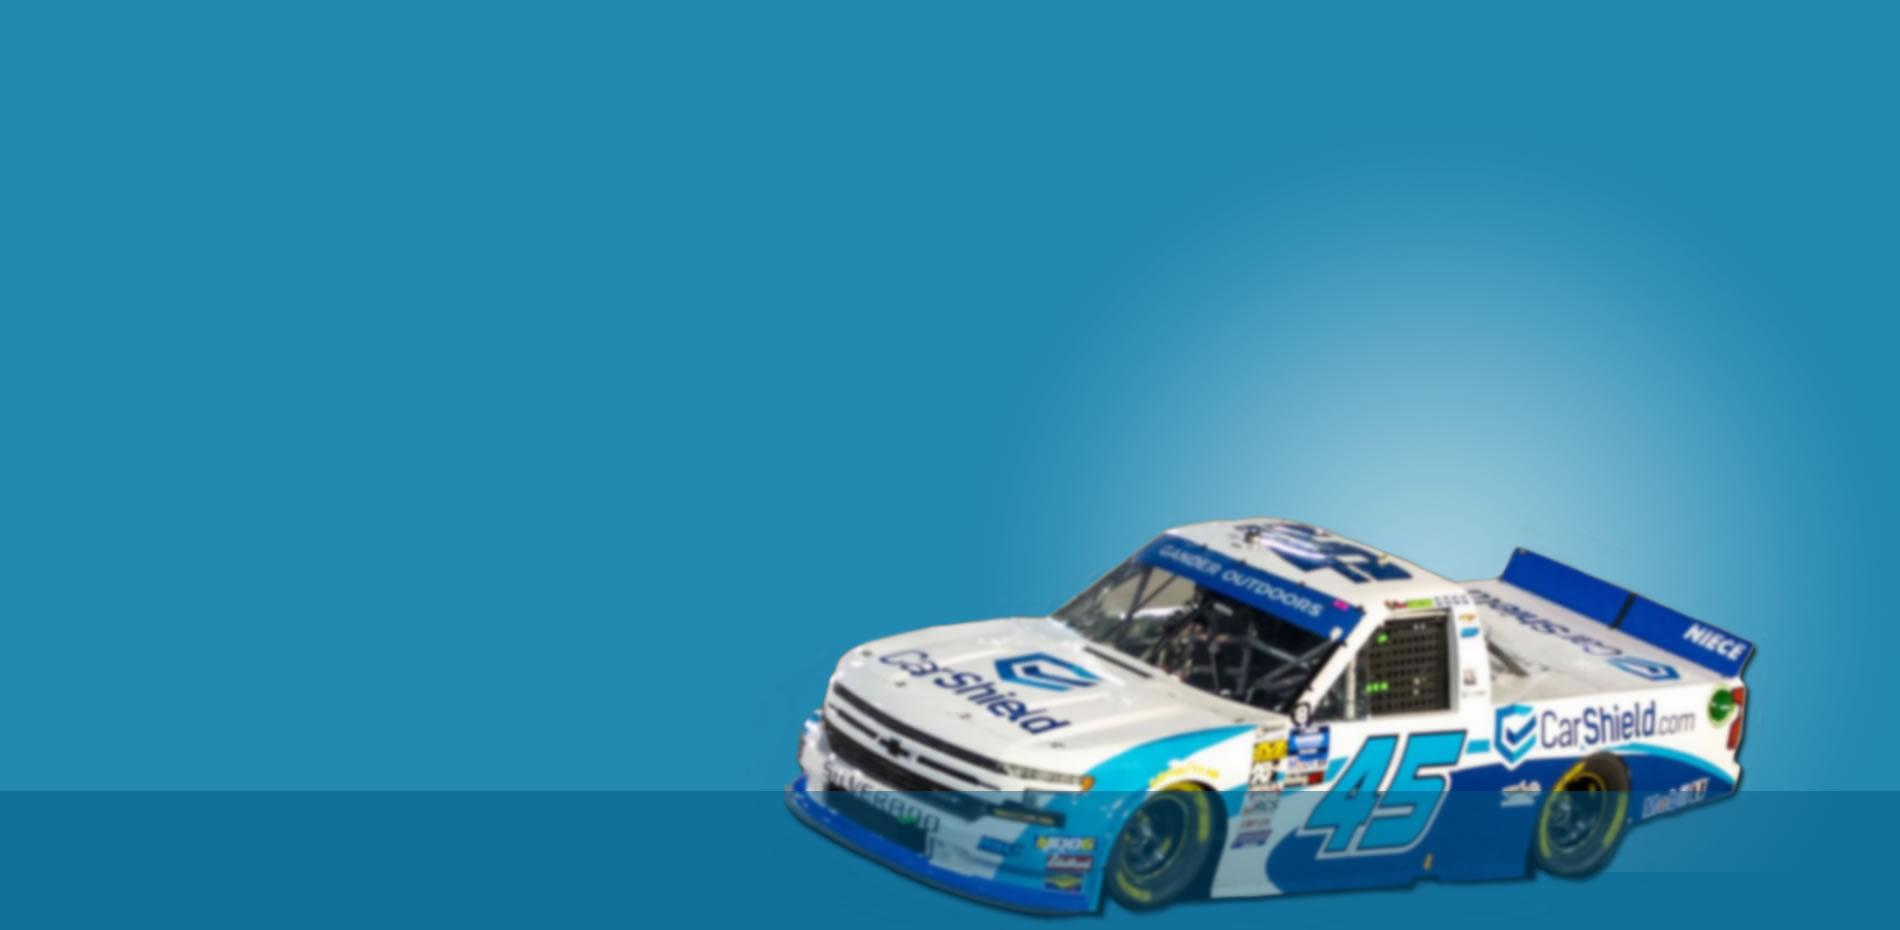 CarShield - USA's #1 Auto Protection Provider